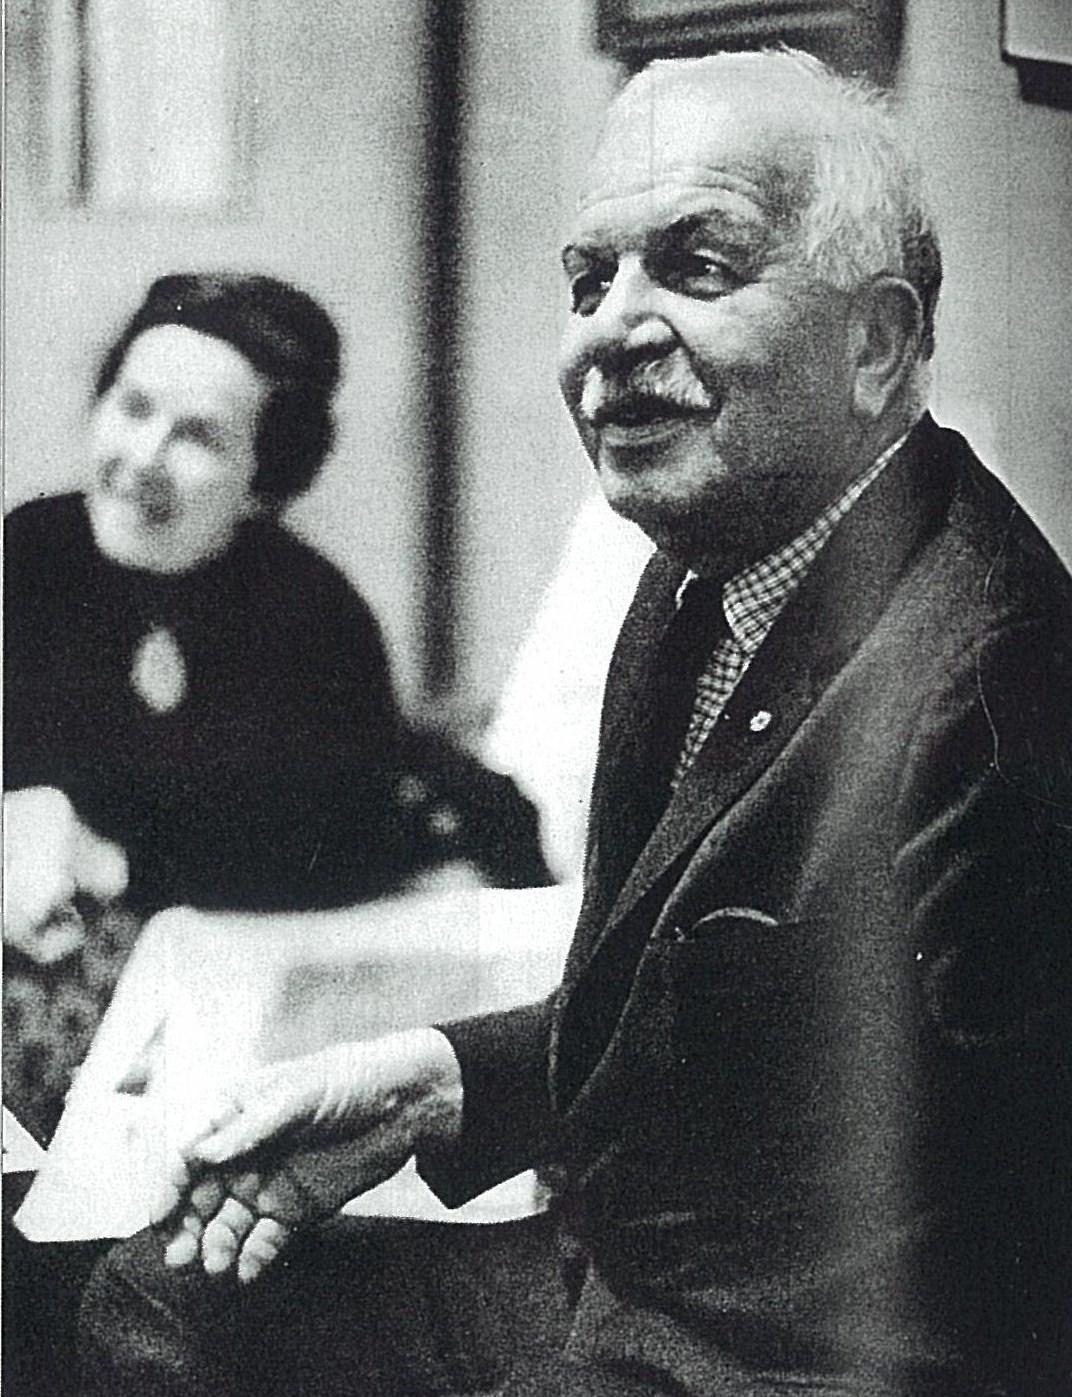 Image of Ben Shahn from Wikidata